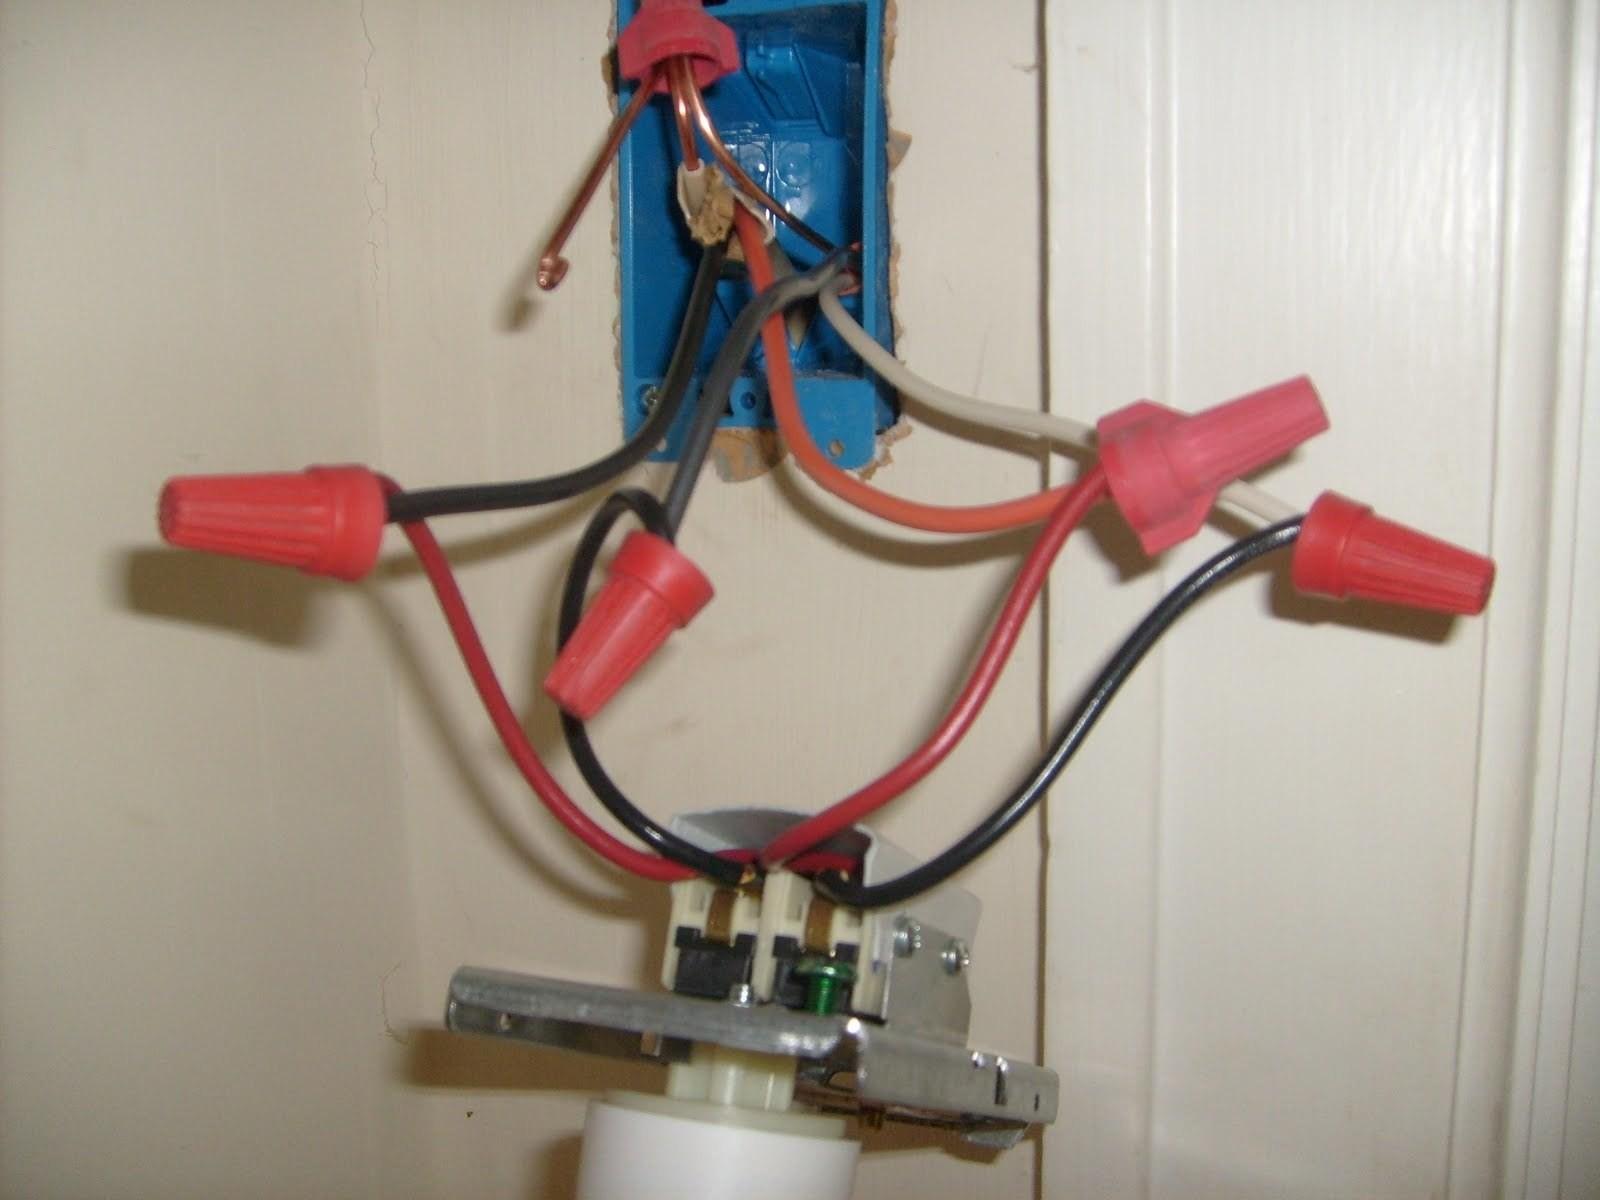 hight resolution of baseboard heater thermostat wiring diagram dimplex baseboard heater thermostat wiring diagram save 240 volt baseboard